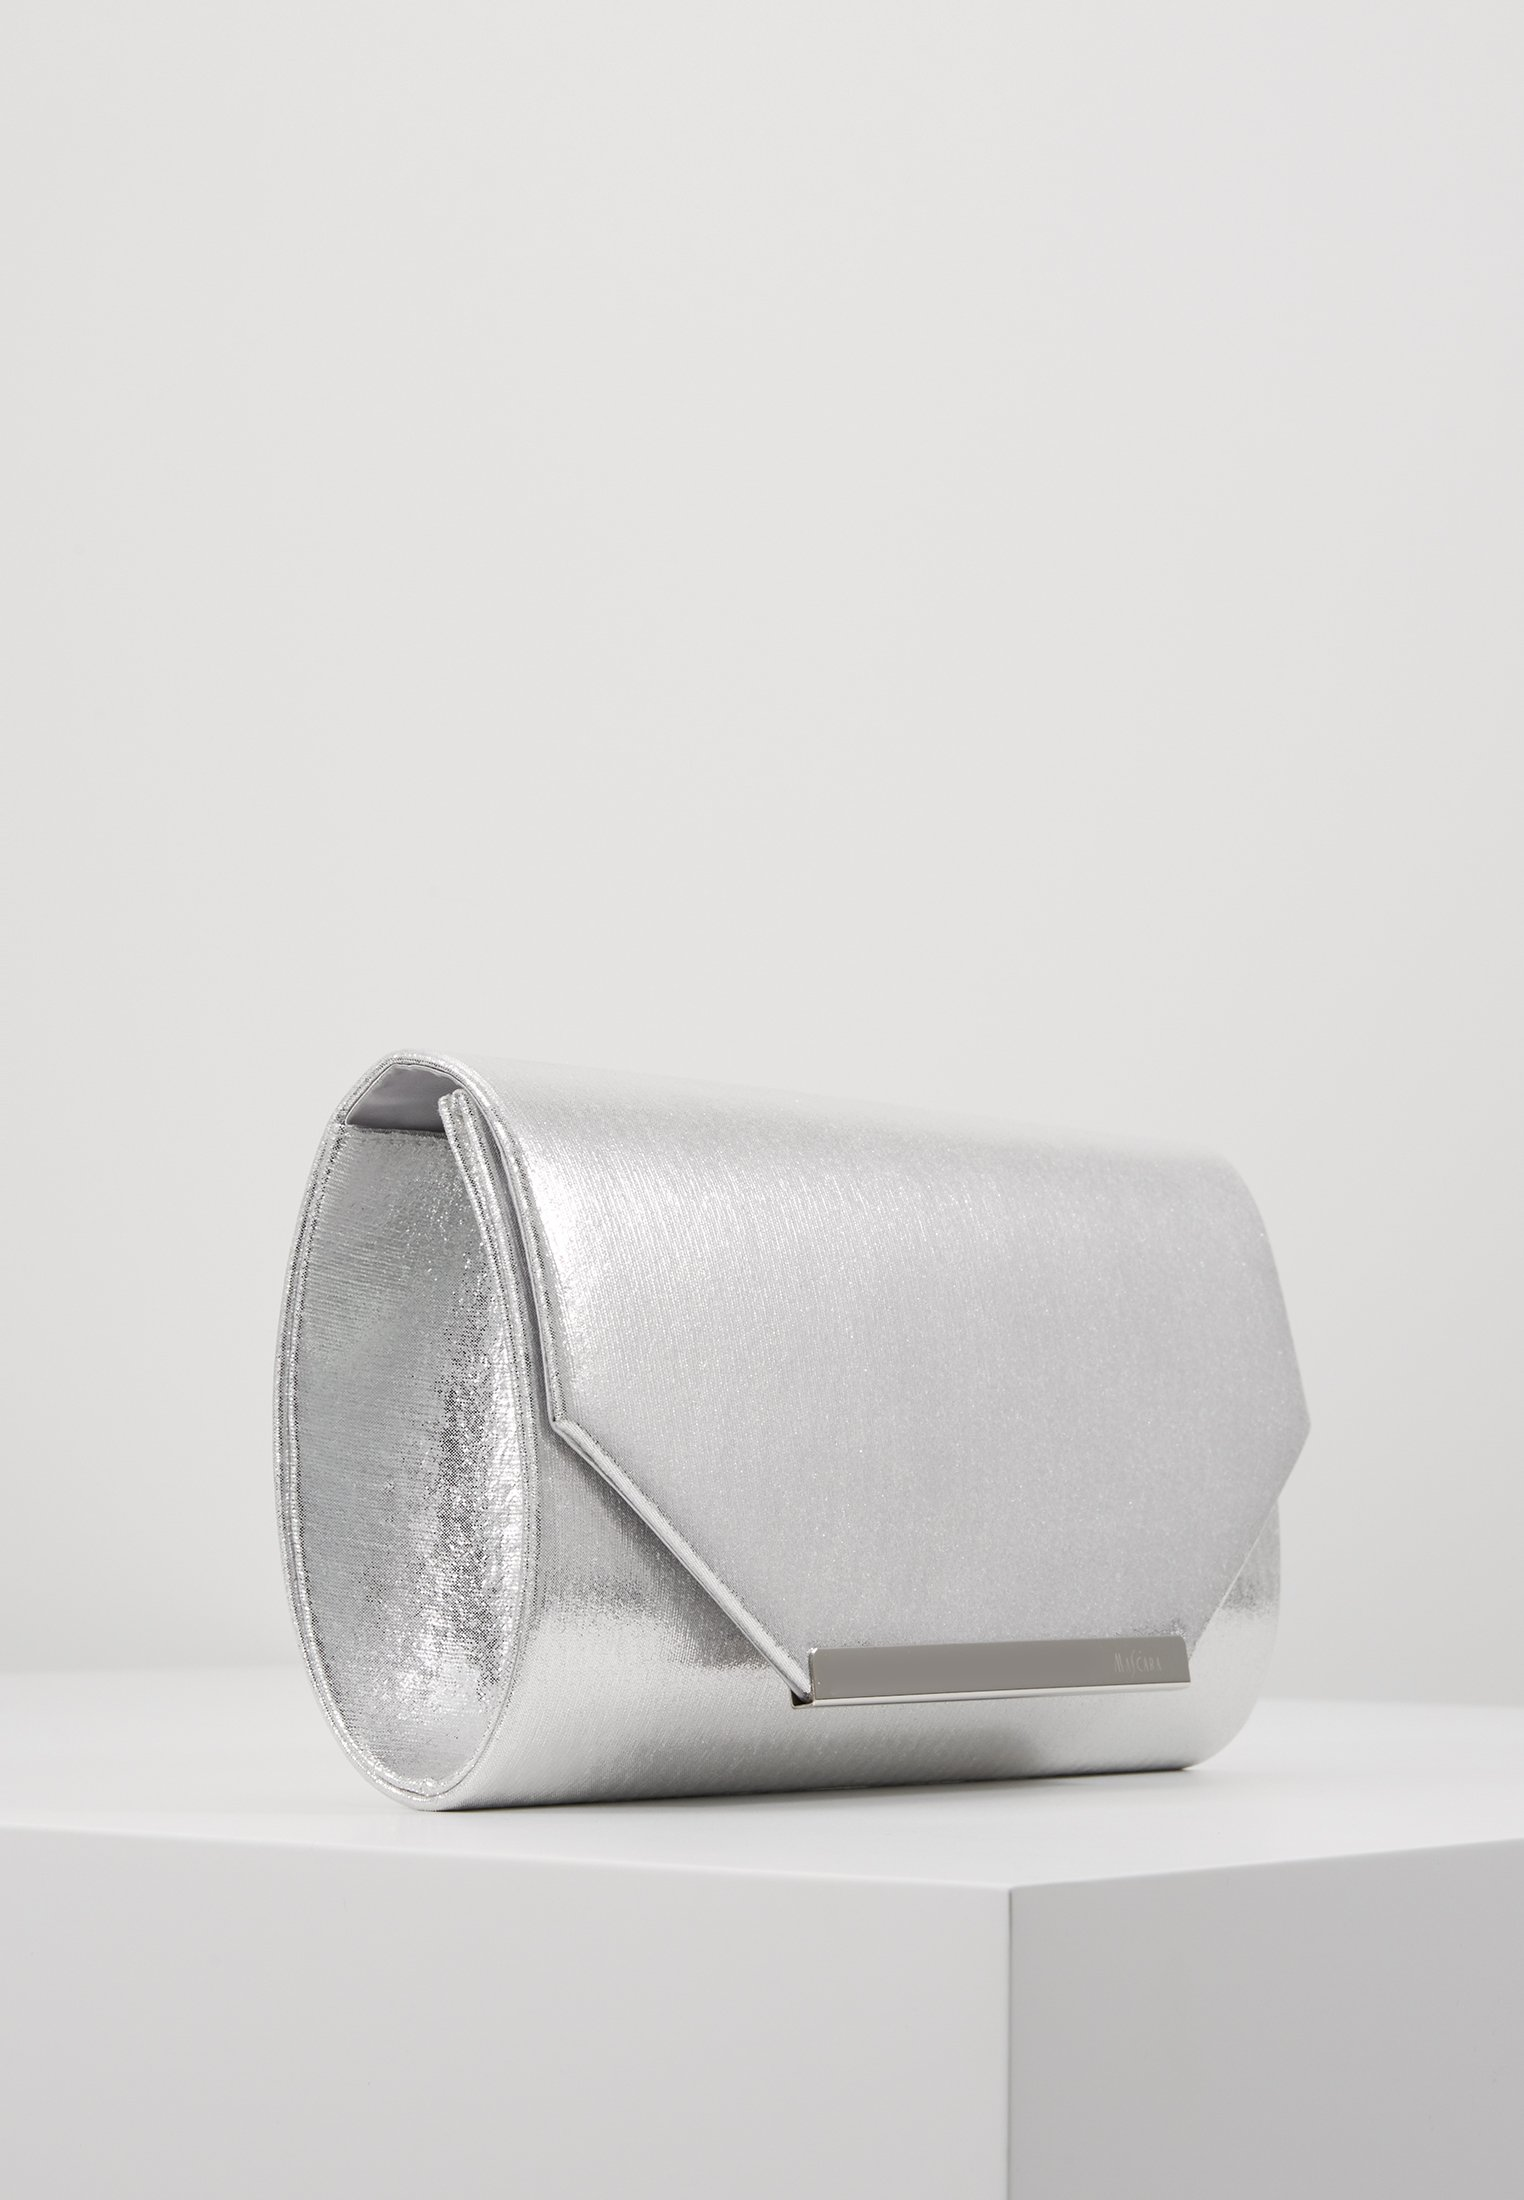 Mascara Pochette - silver